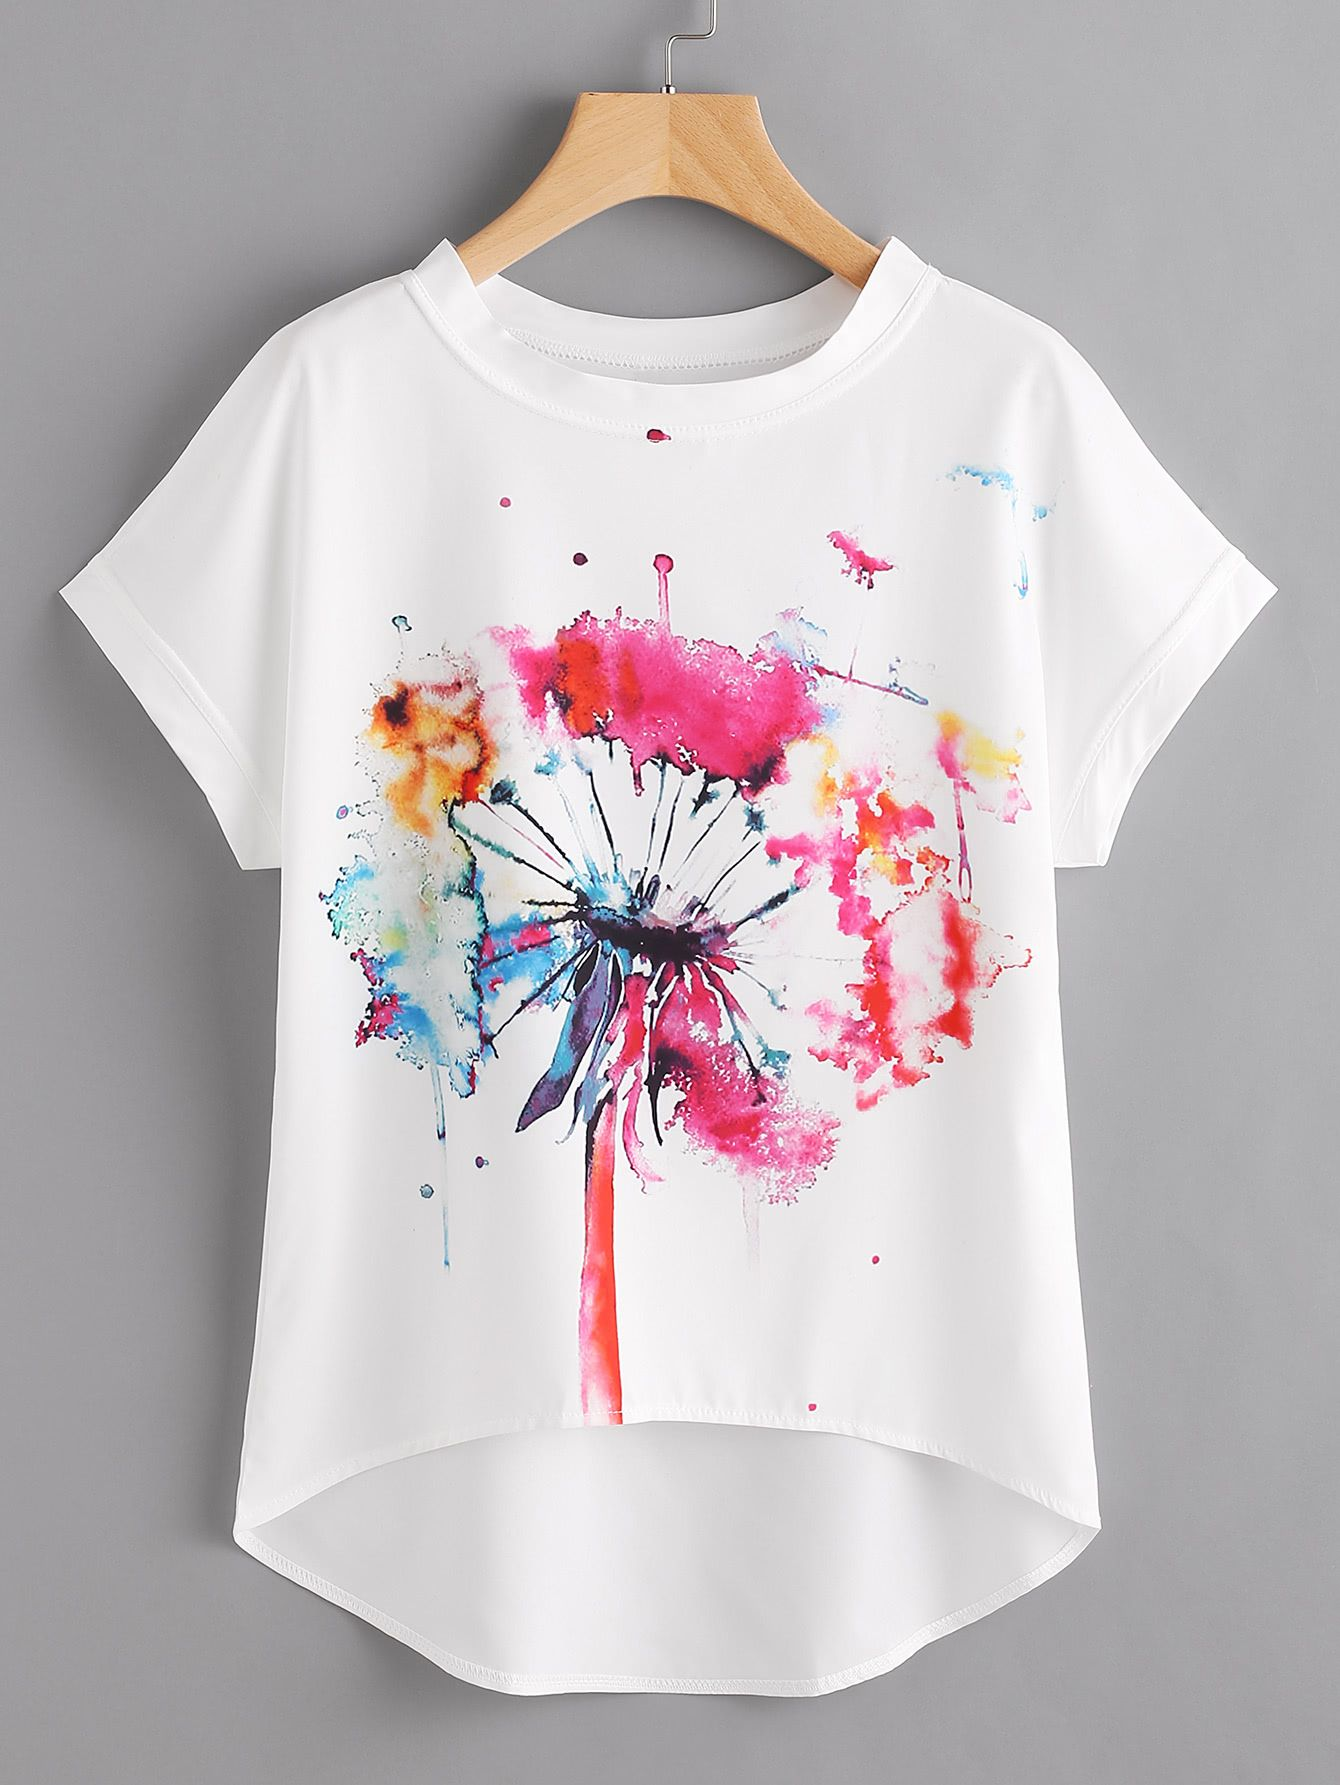 Tshirt Logo Design Trendy Watercolor Merchendies Colorful